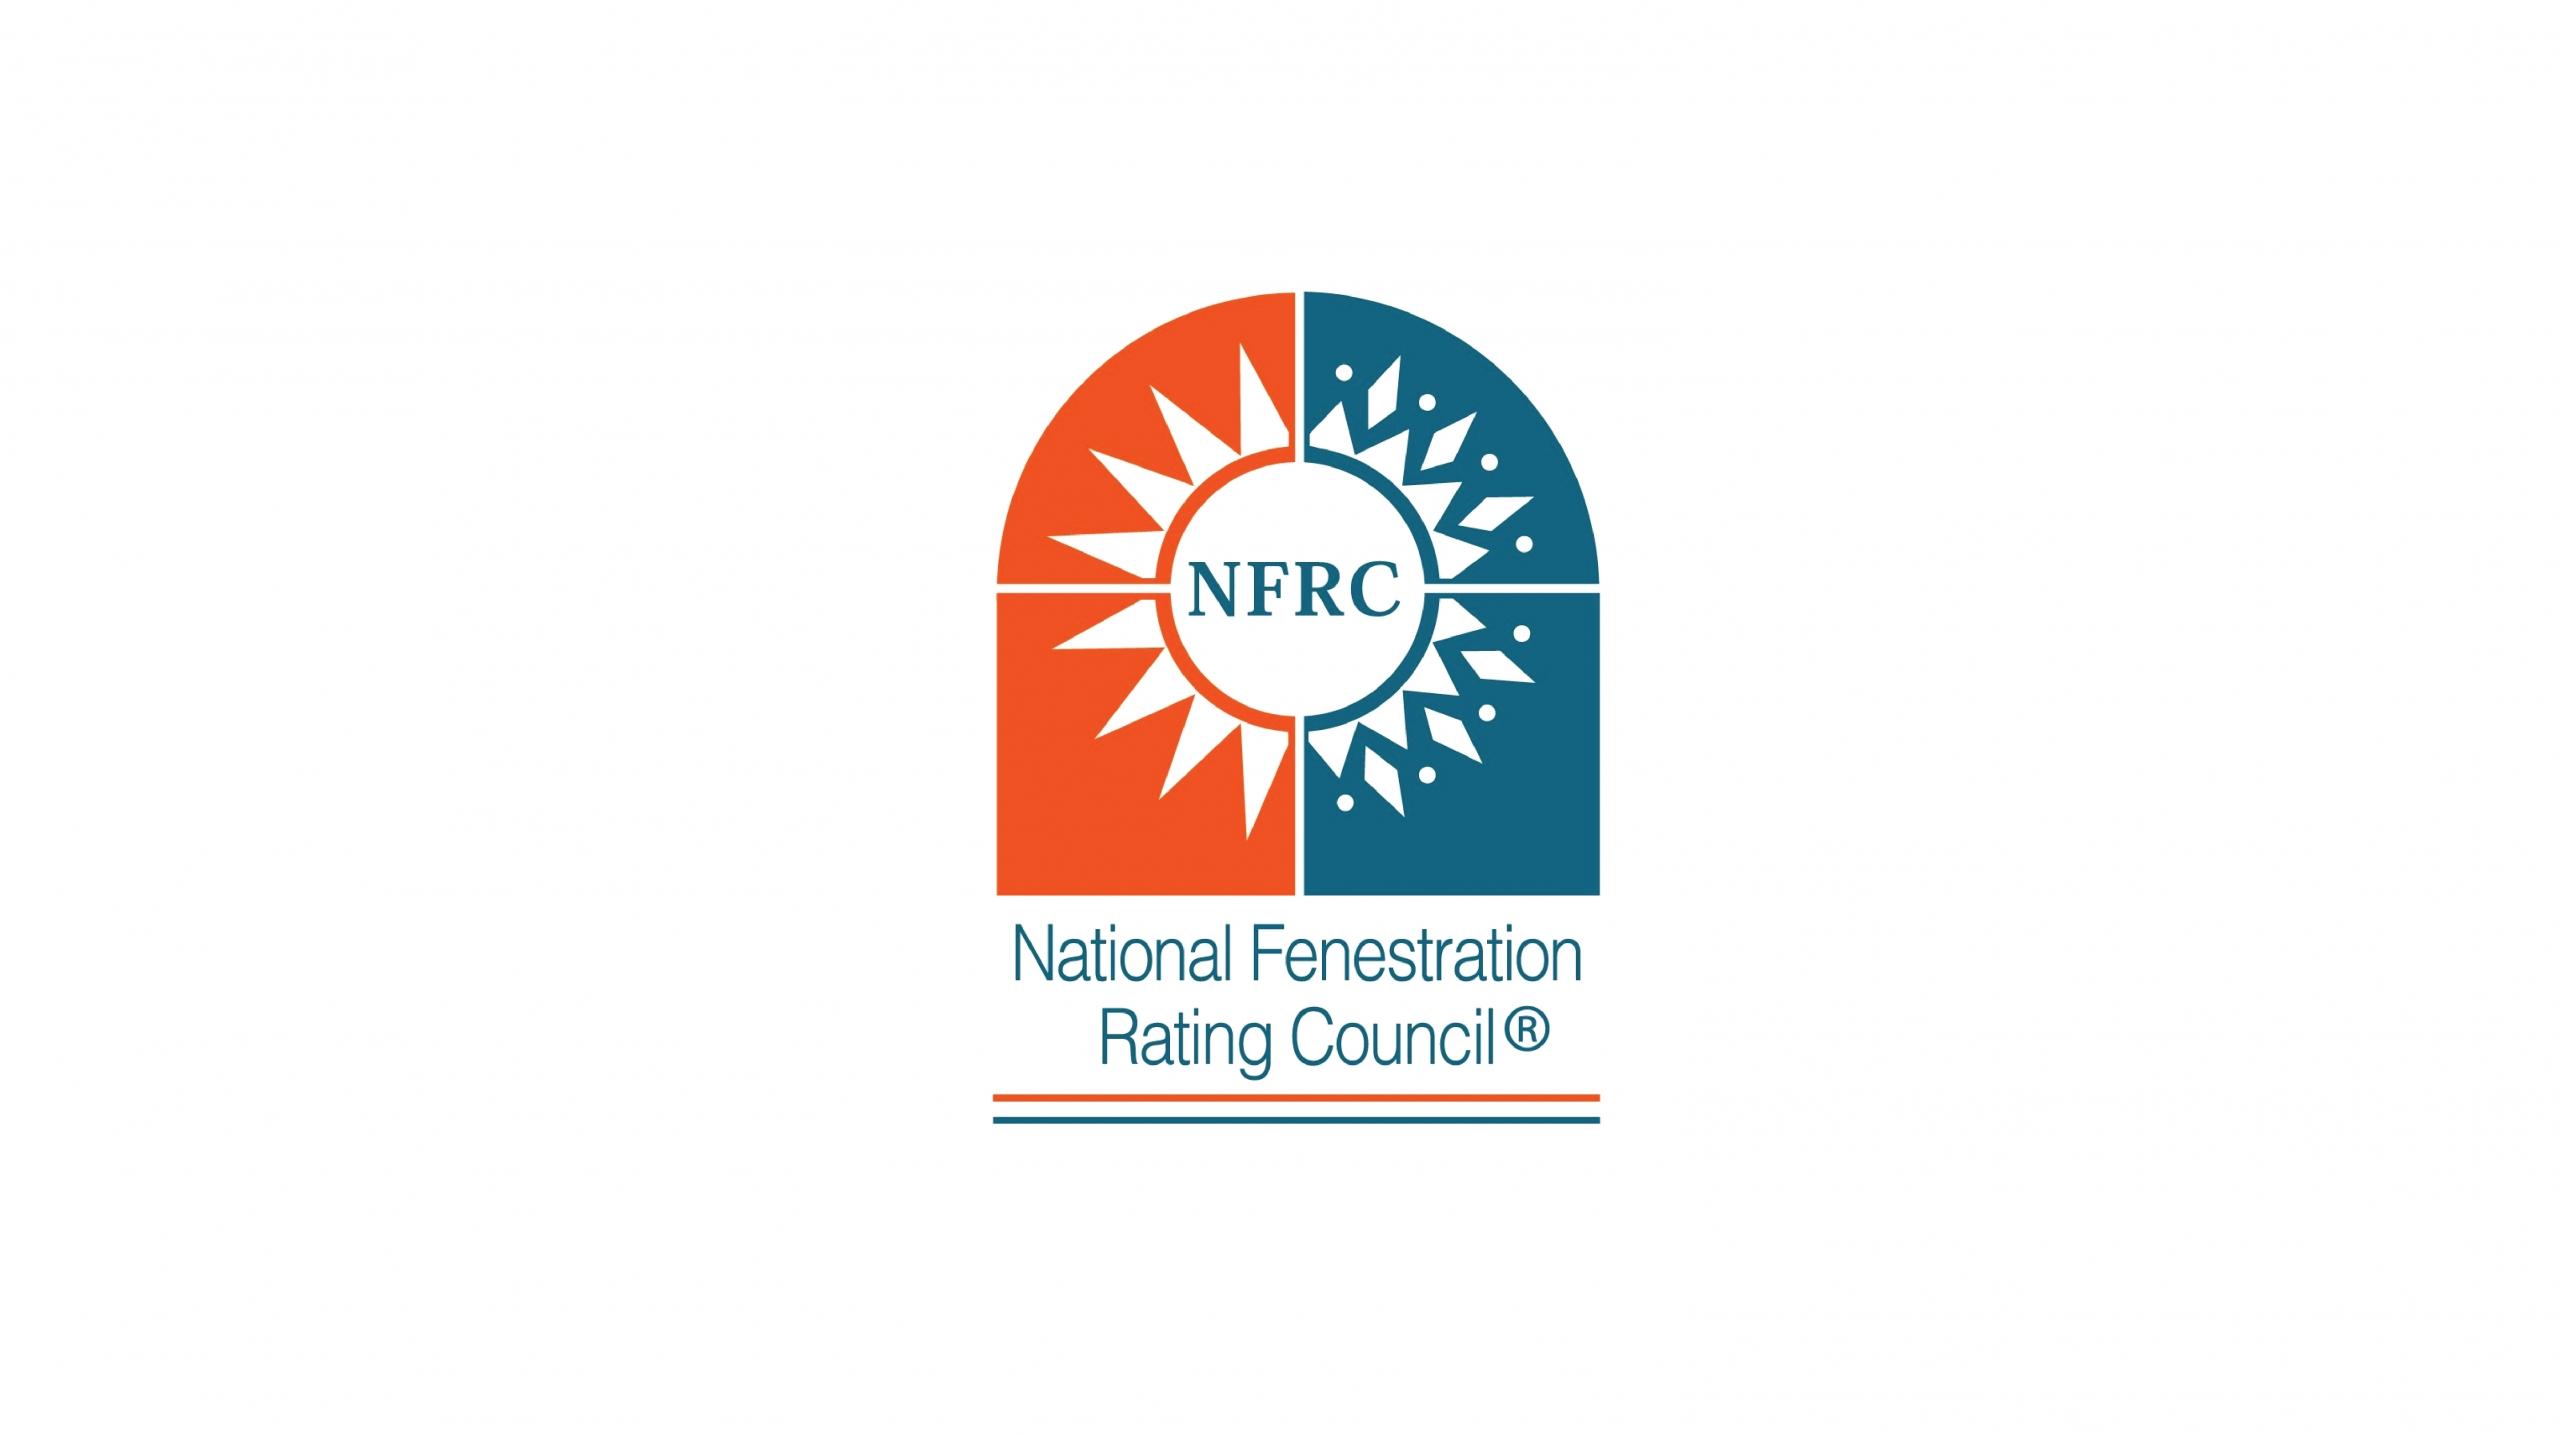 NFRC Certification Logo